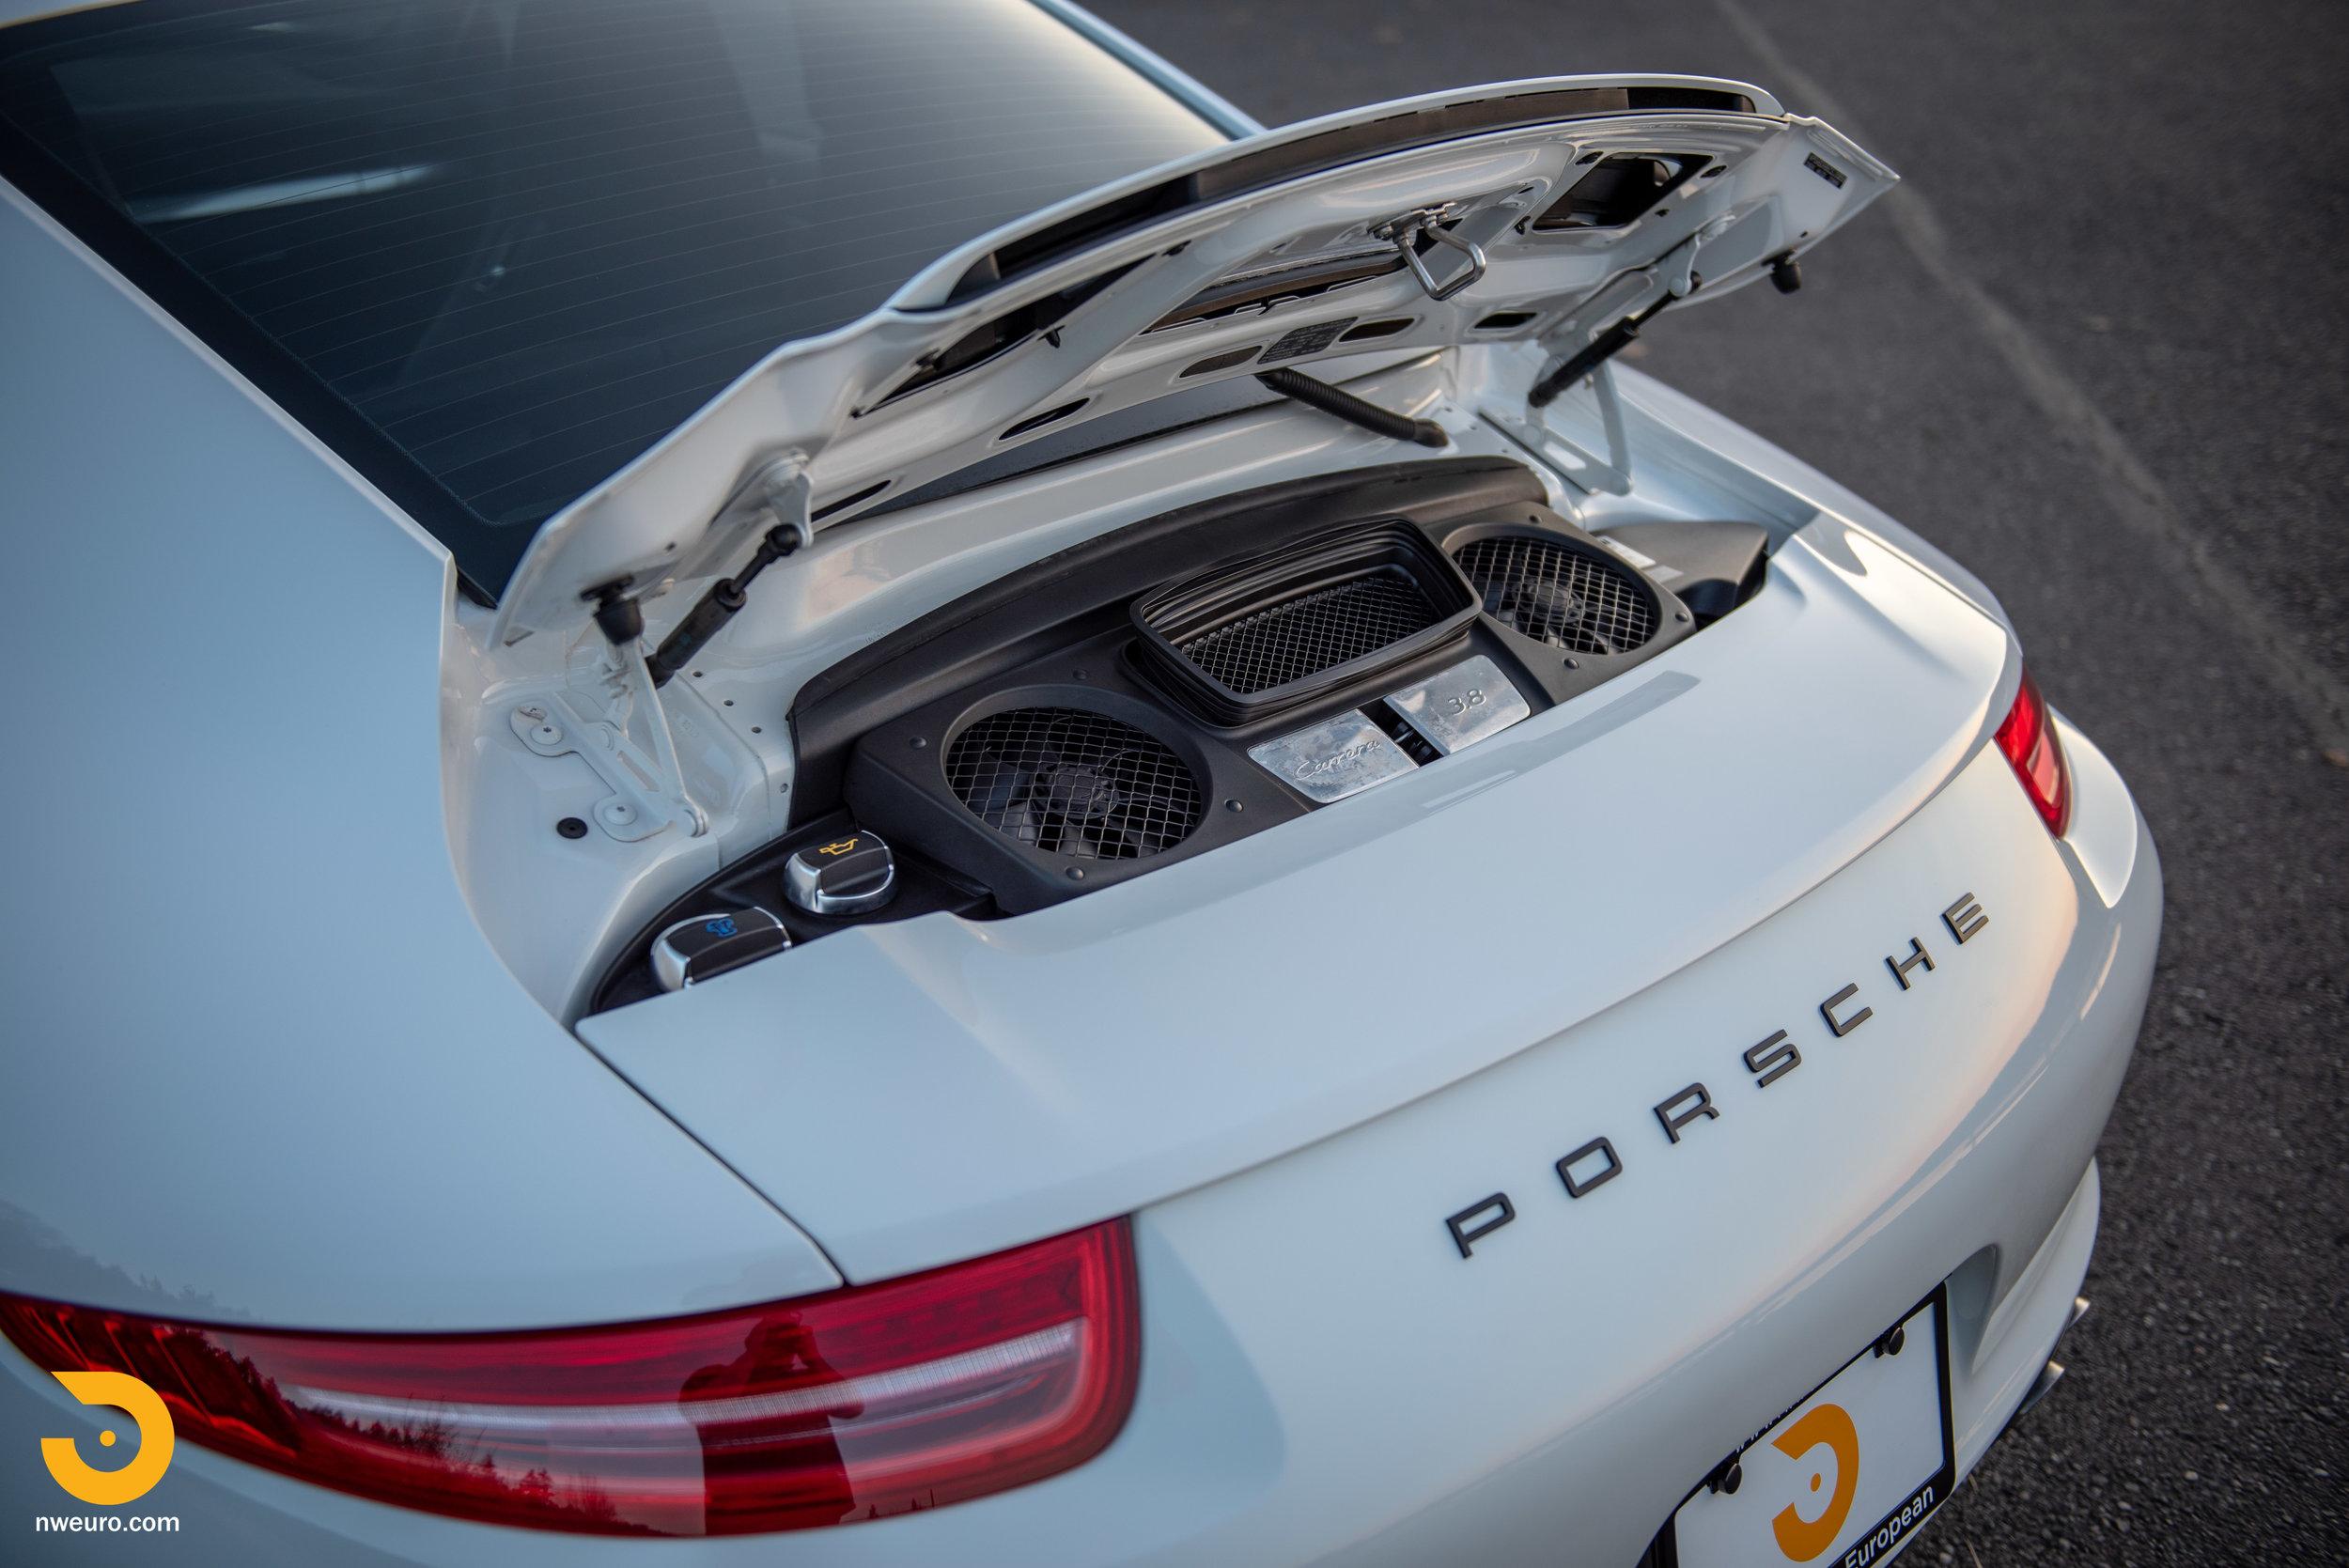 2012 Porsche Carrera S-27.jpg